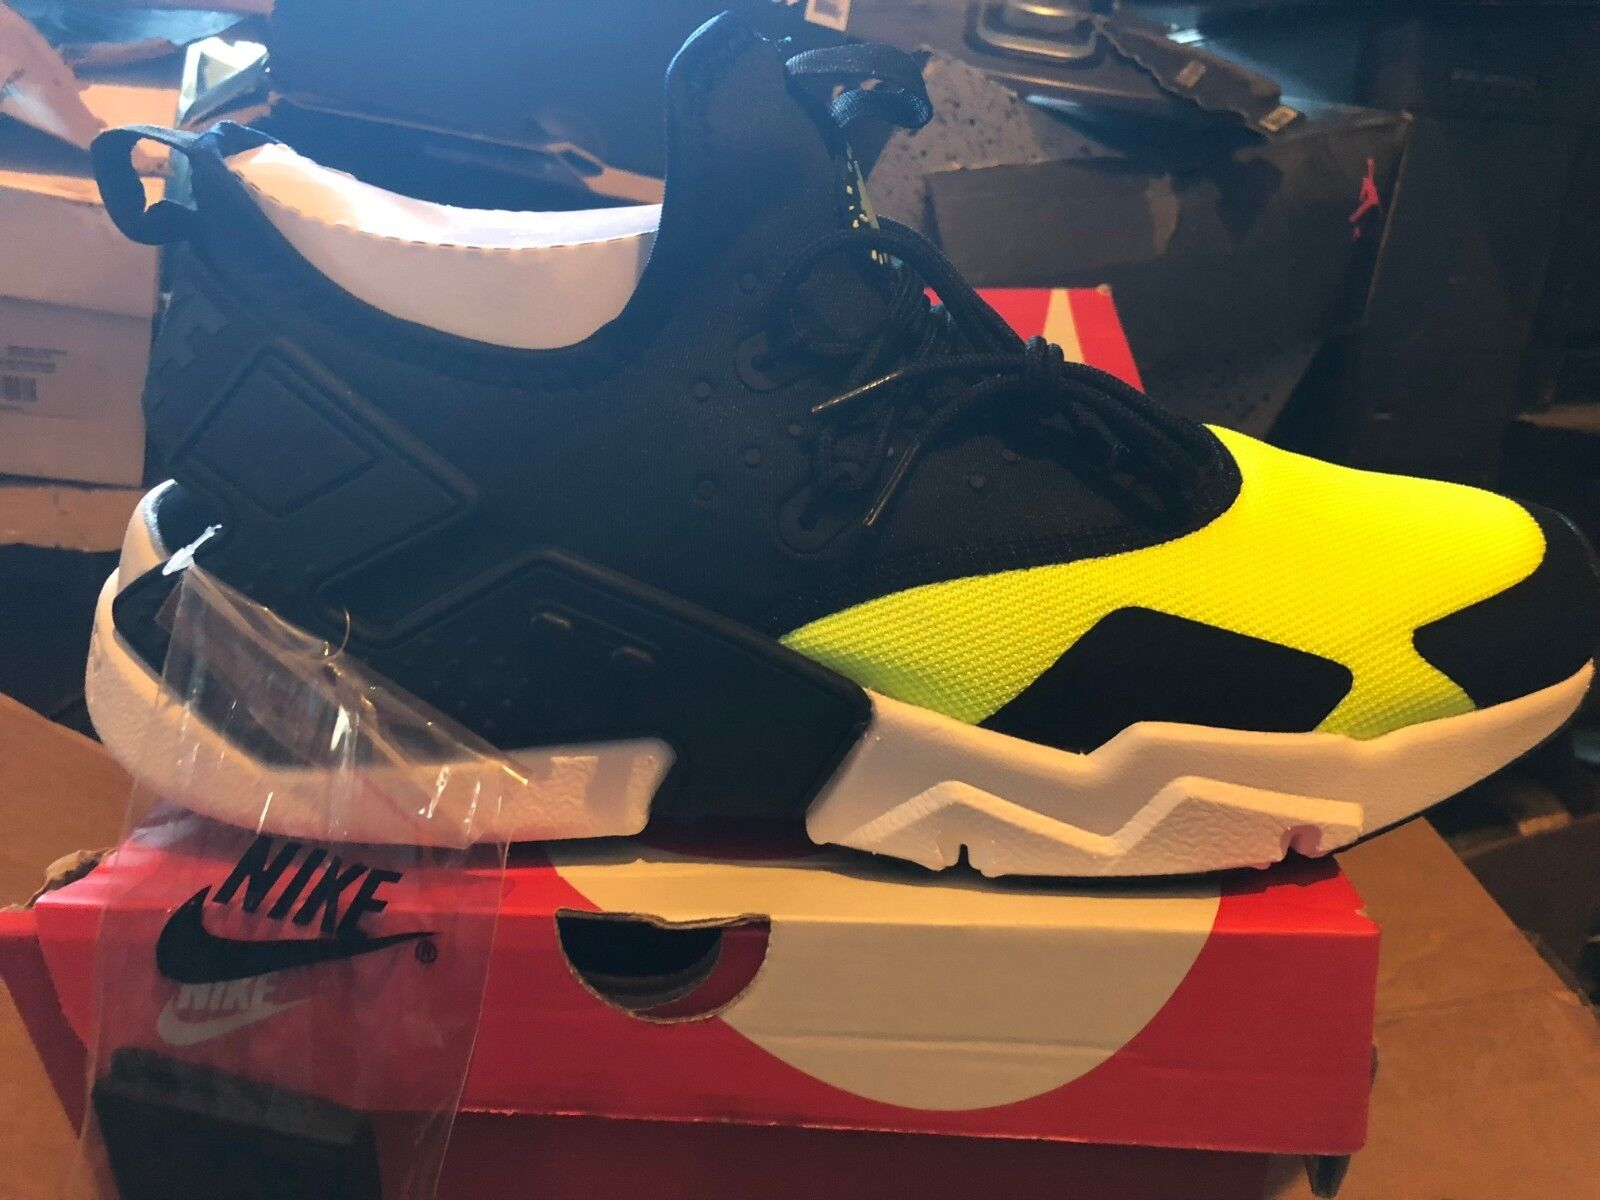 Nike air huarache treiben bnib blk größe / volt / WEISS größe blk 12 ah7334 700 f50c79